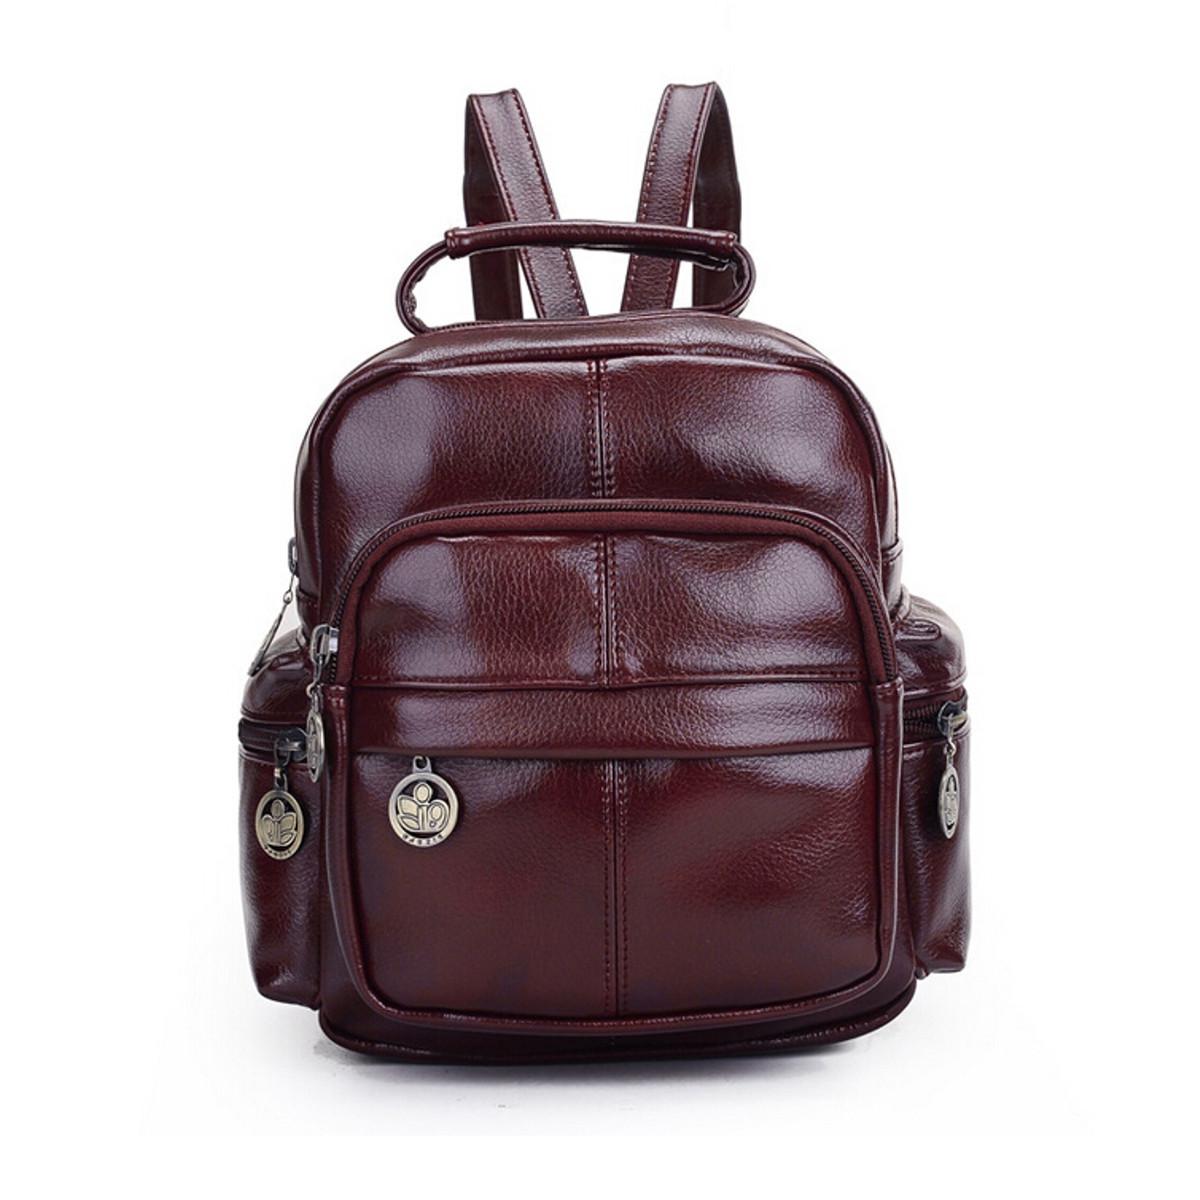 Leather Backpack: Meet Models